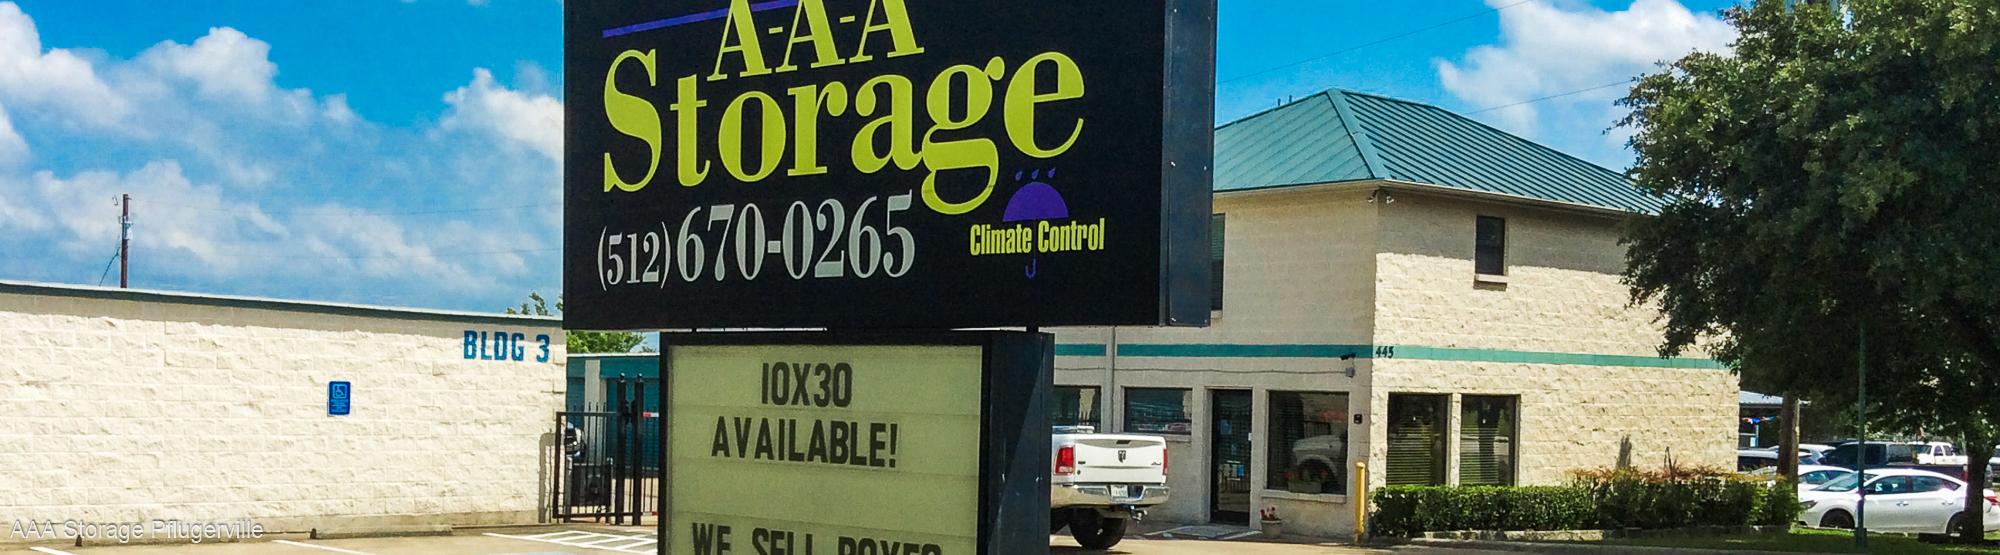 AAA Storage in Pflugerville Texas